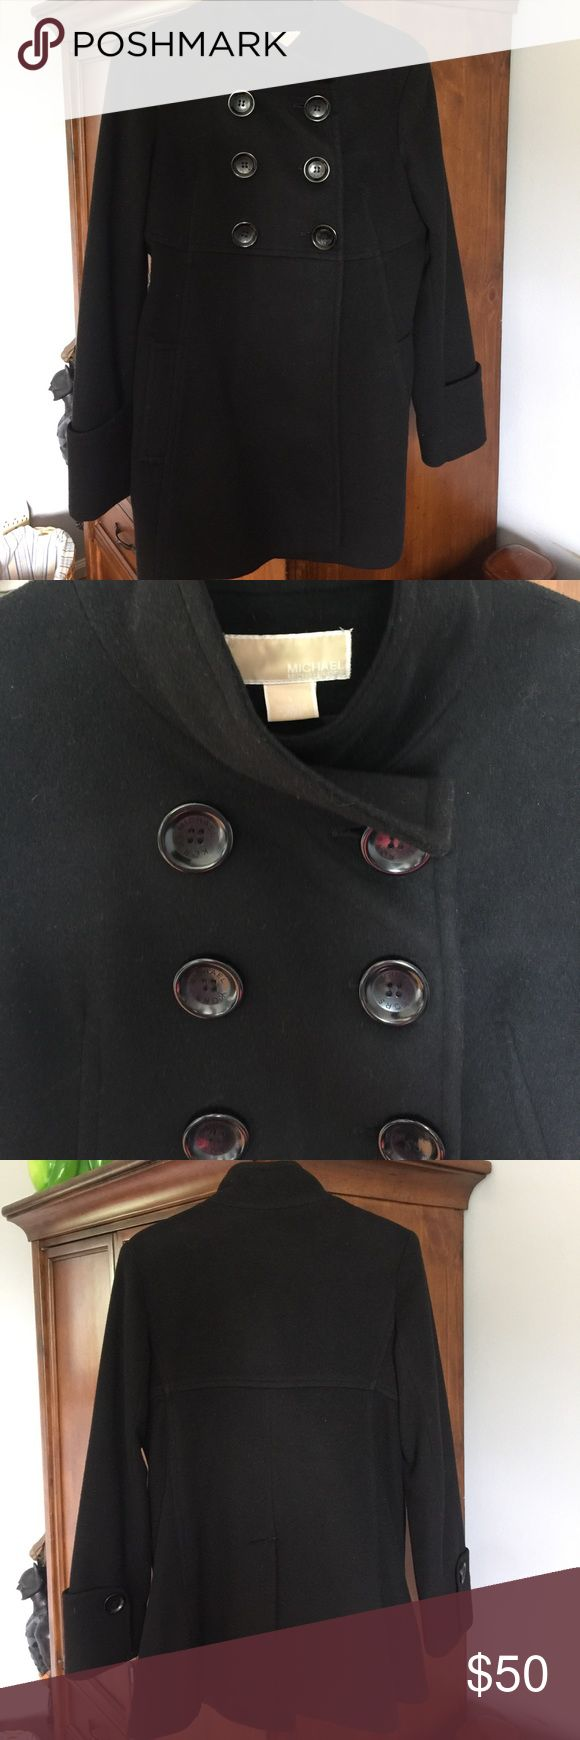 Women's Michael Kors dress coat size 8 Women's size 8 Michael Kors dress coat. 80% wool 20% nylon Michael Kors Jackets & Coats Pea Coats